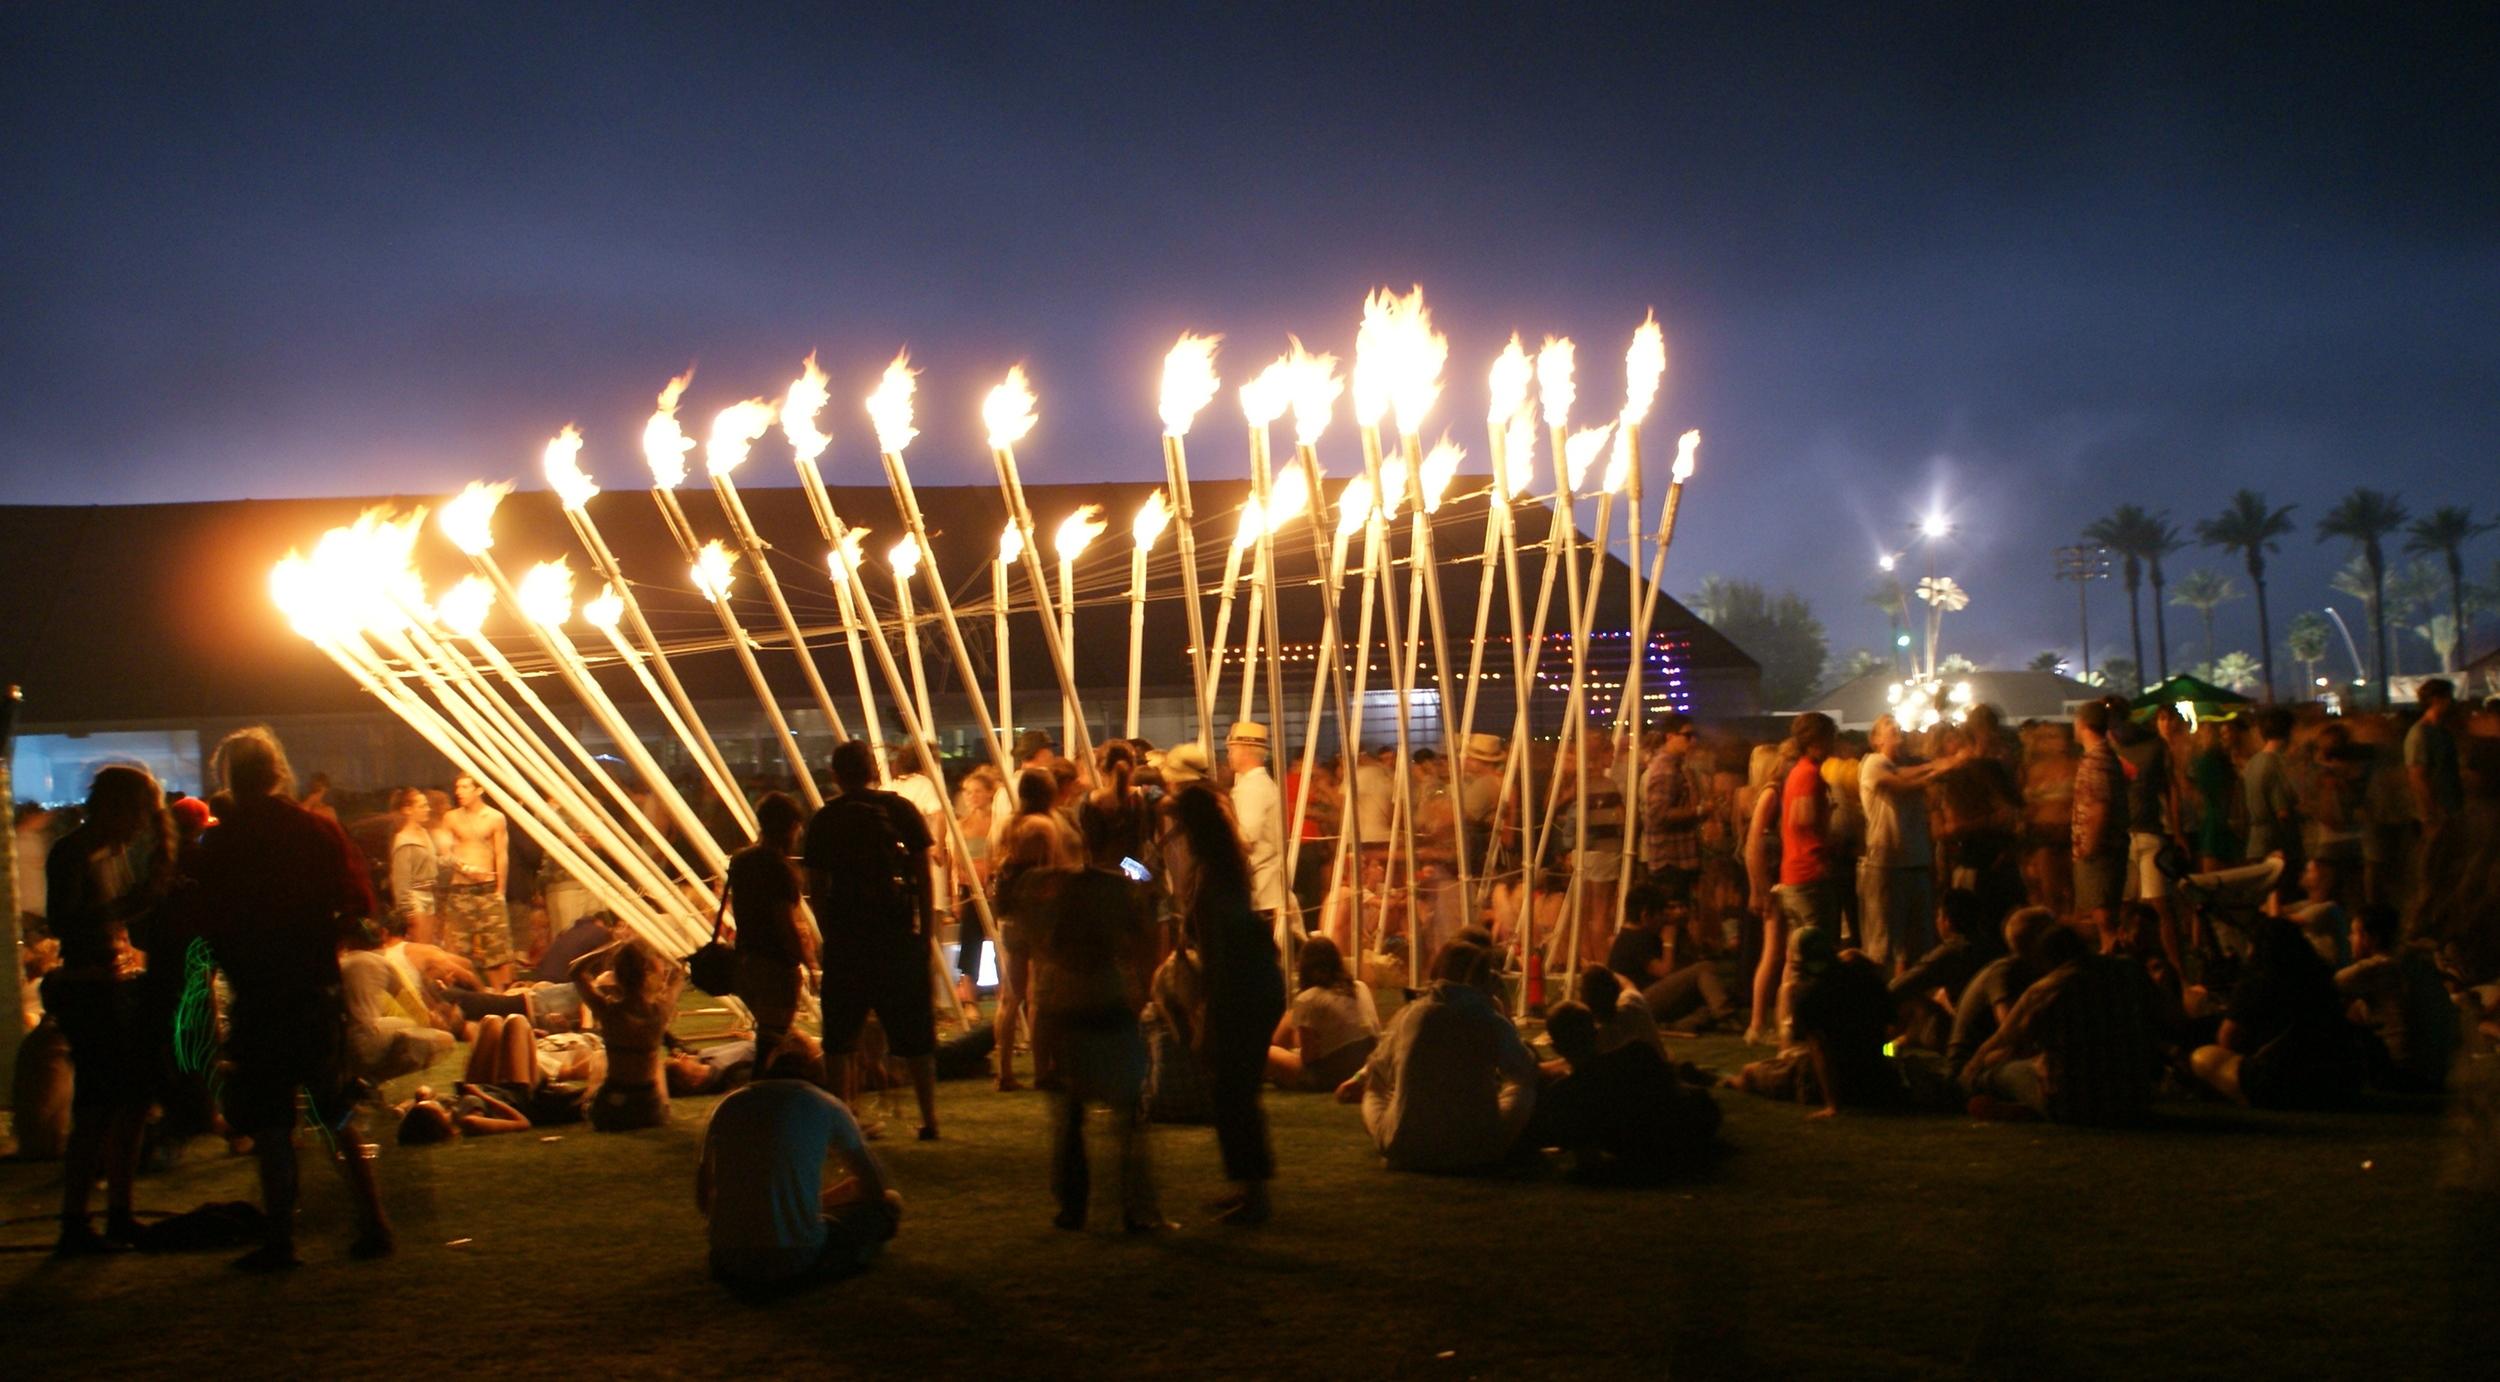 Pyrocardium, Coachella 2009. Photo copyright  Rasmin ,  https://www.flickr.com/photos/rasmin/3471190025 .